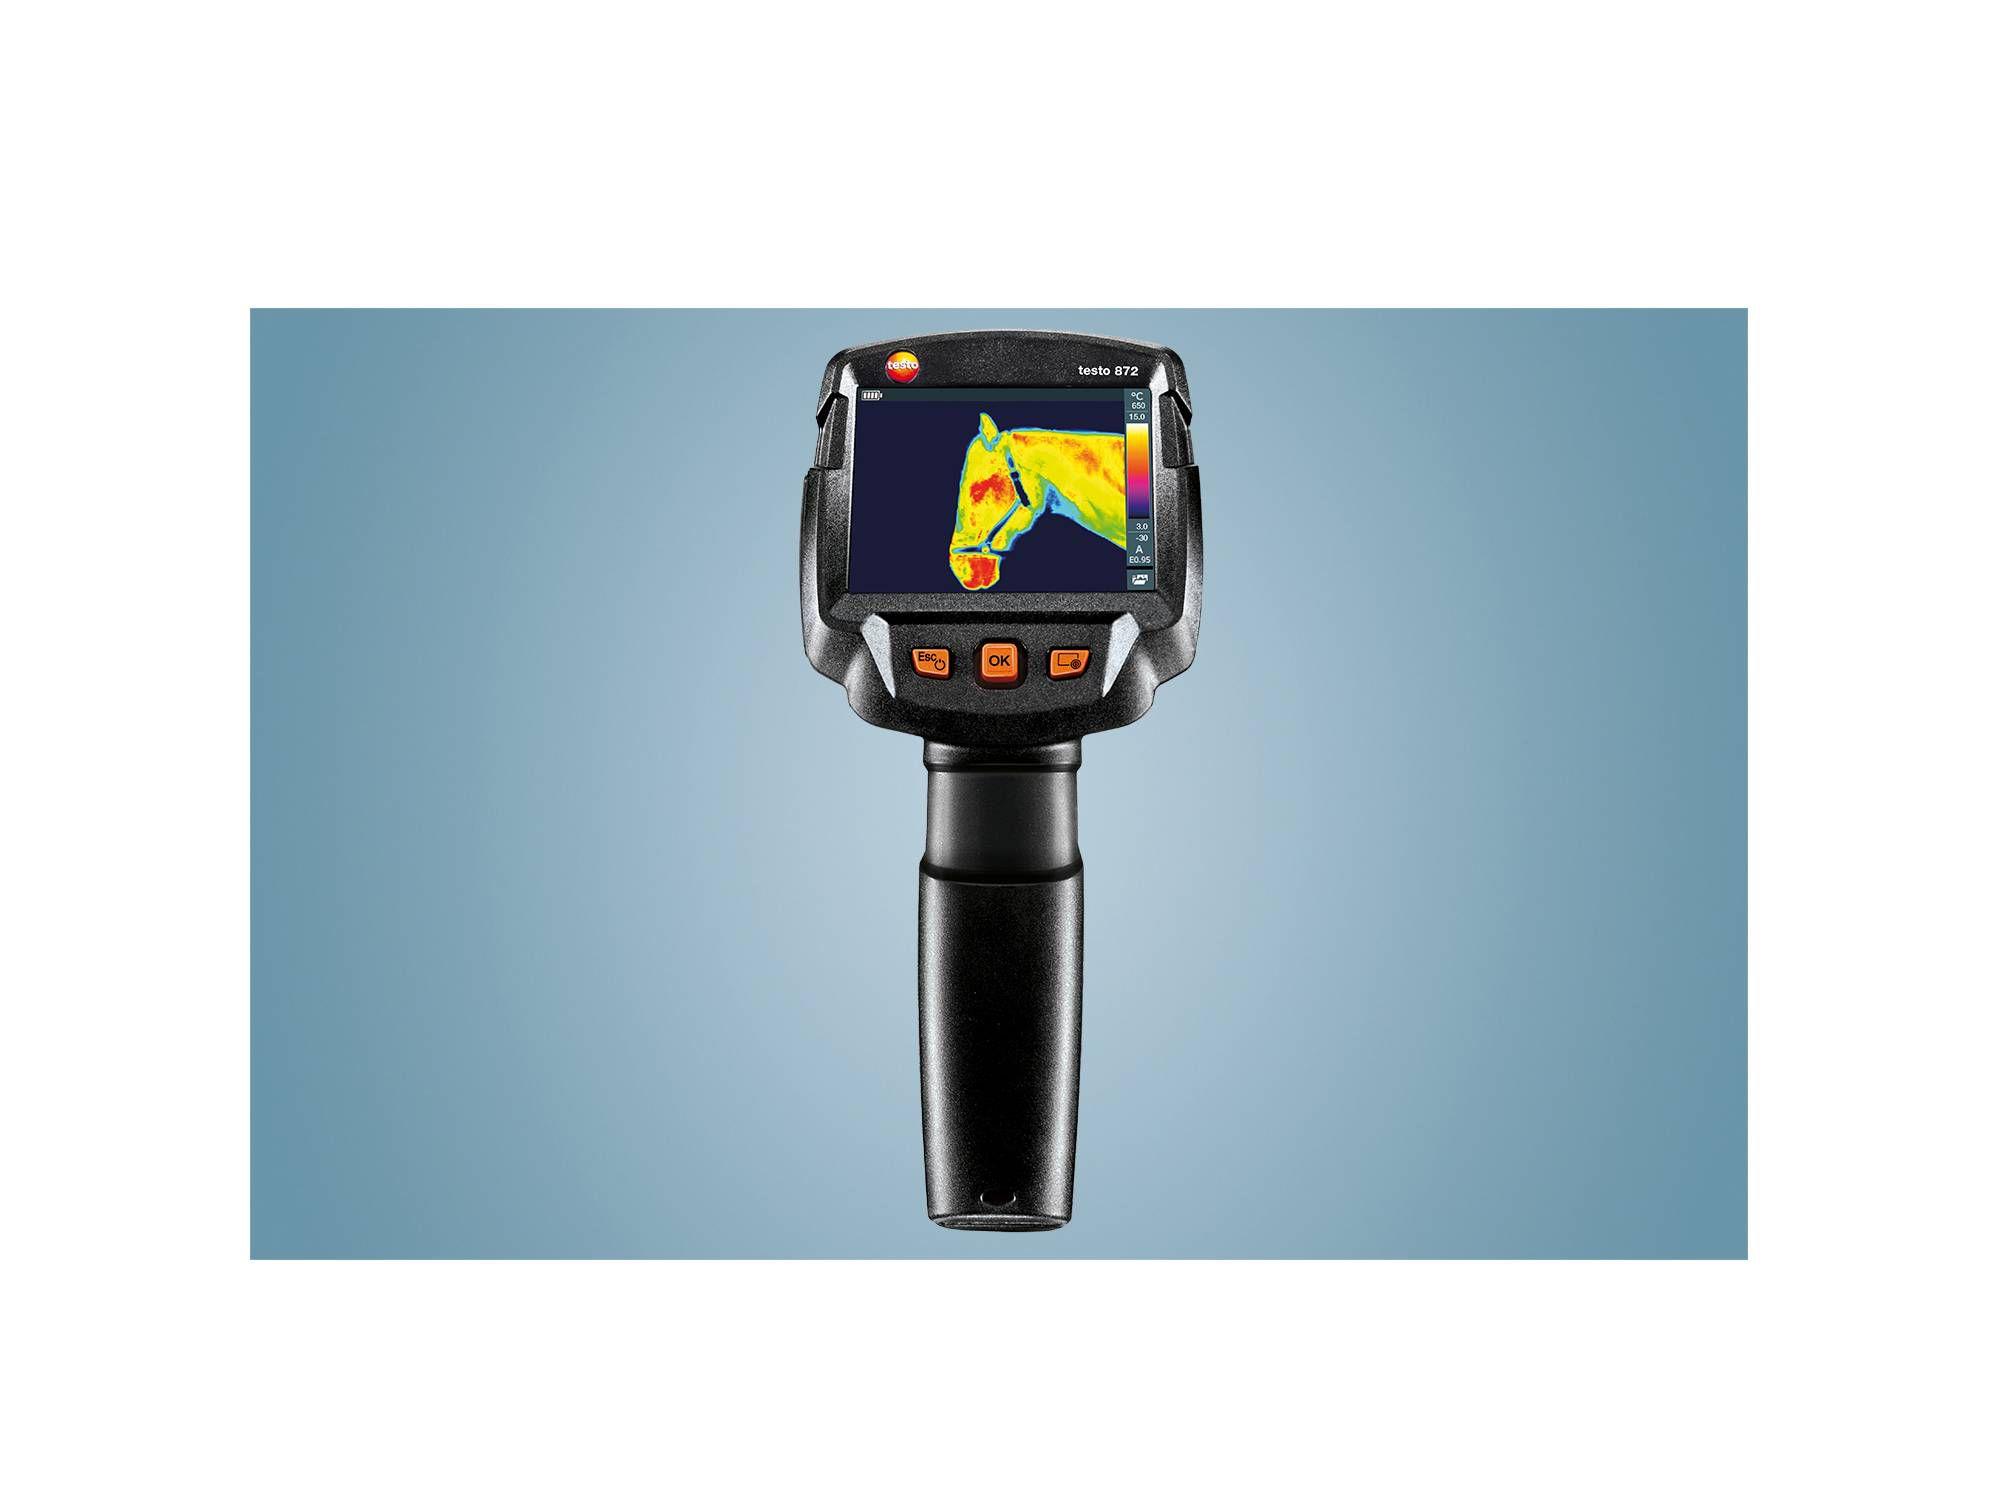 Wärmebildkamera - testo 872